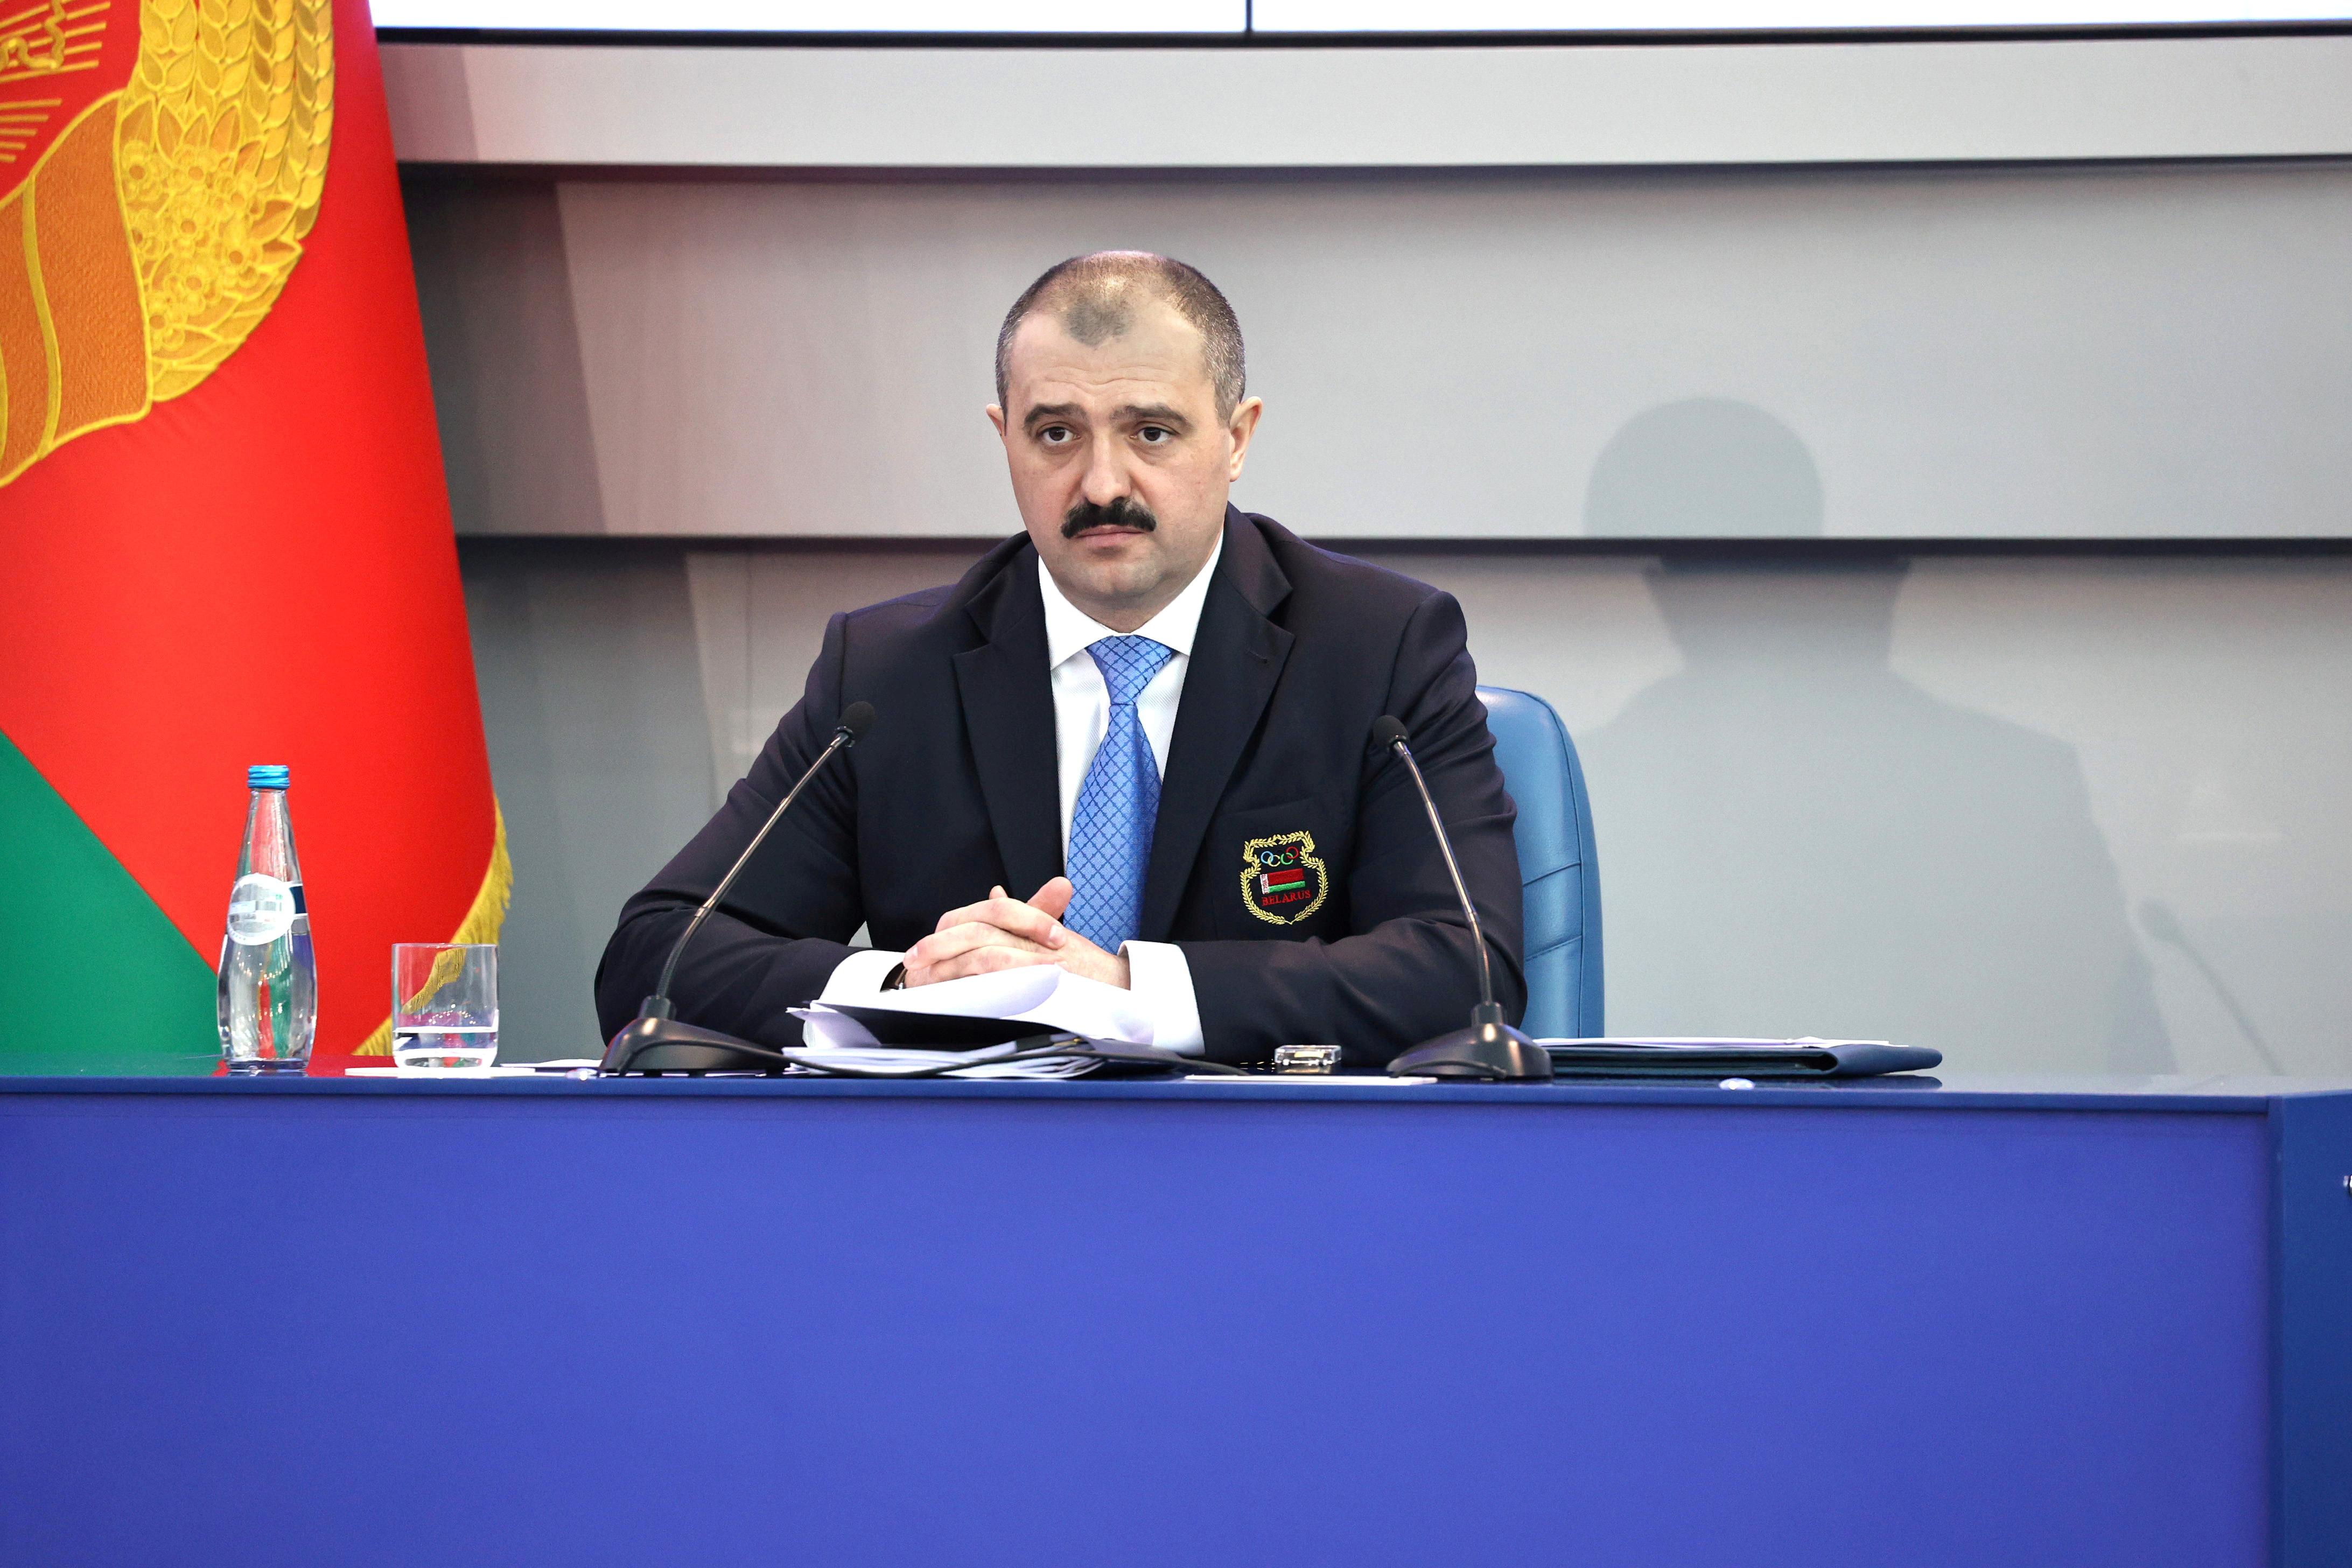 Newly-appointed head of the Belarusian Olympic Committee Viktor Lukashenko attends a meeting in Minsk, Belarus February 26, 2021. Sergei Sheleg/BelTA/Handout via REUTERS/File Photo